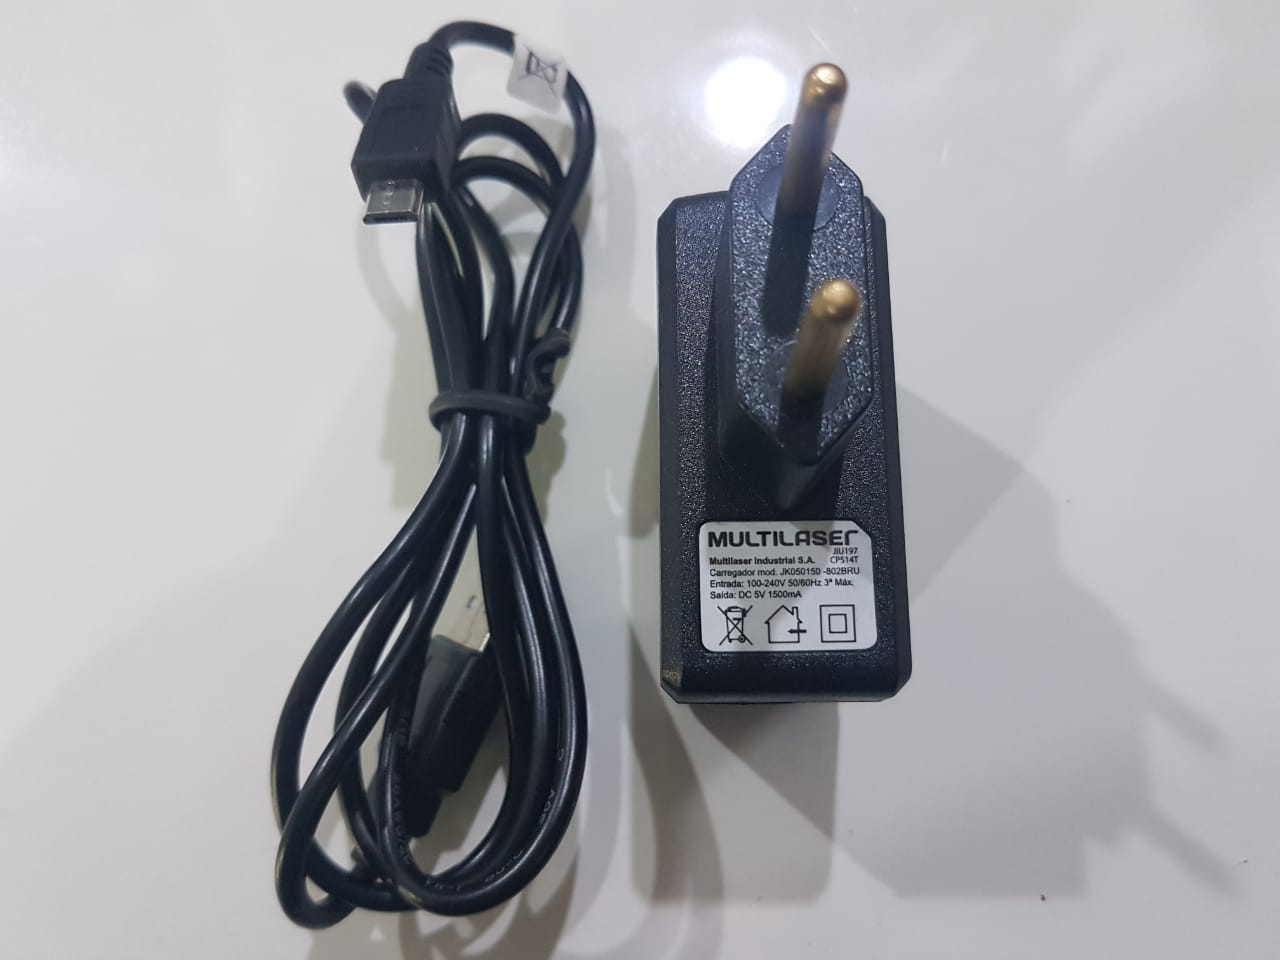 2 Carregadores Celulares e Tablets  Multilaser M10a M9 M8 M7s Micro Usb Original 1500Mah Bivolt